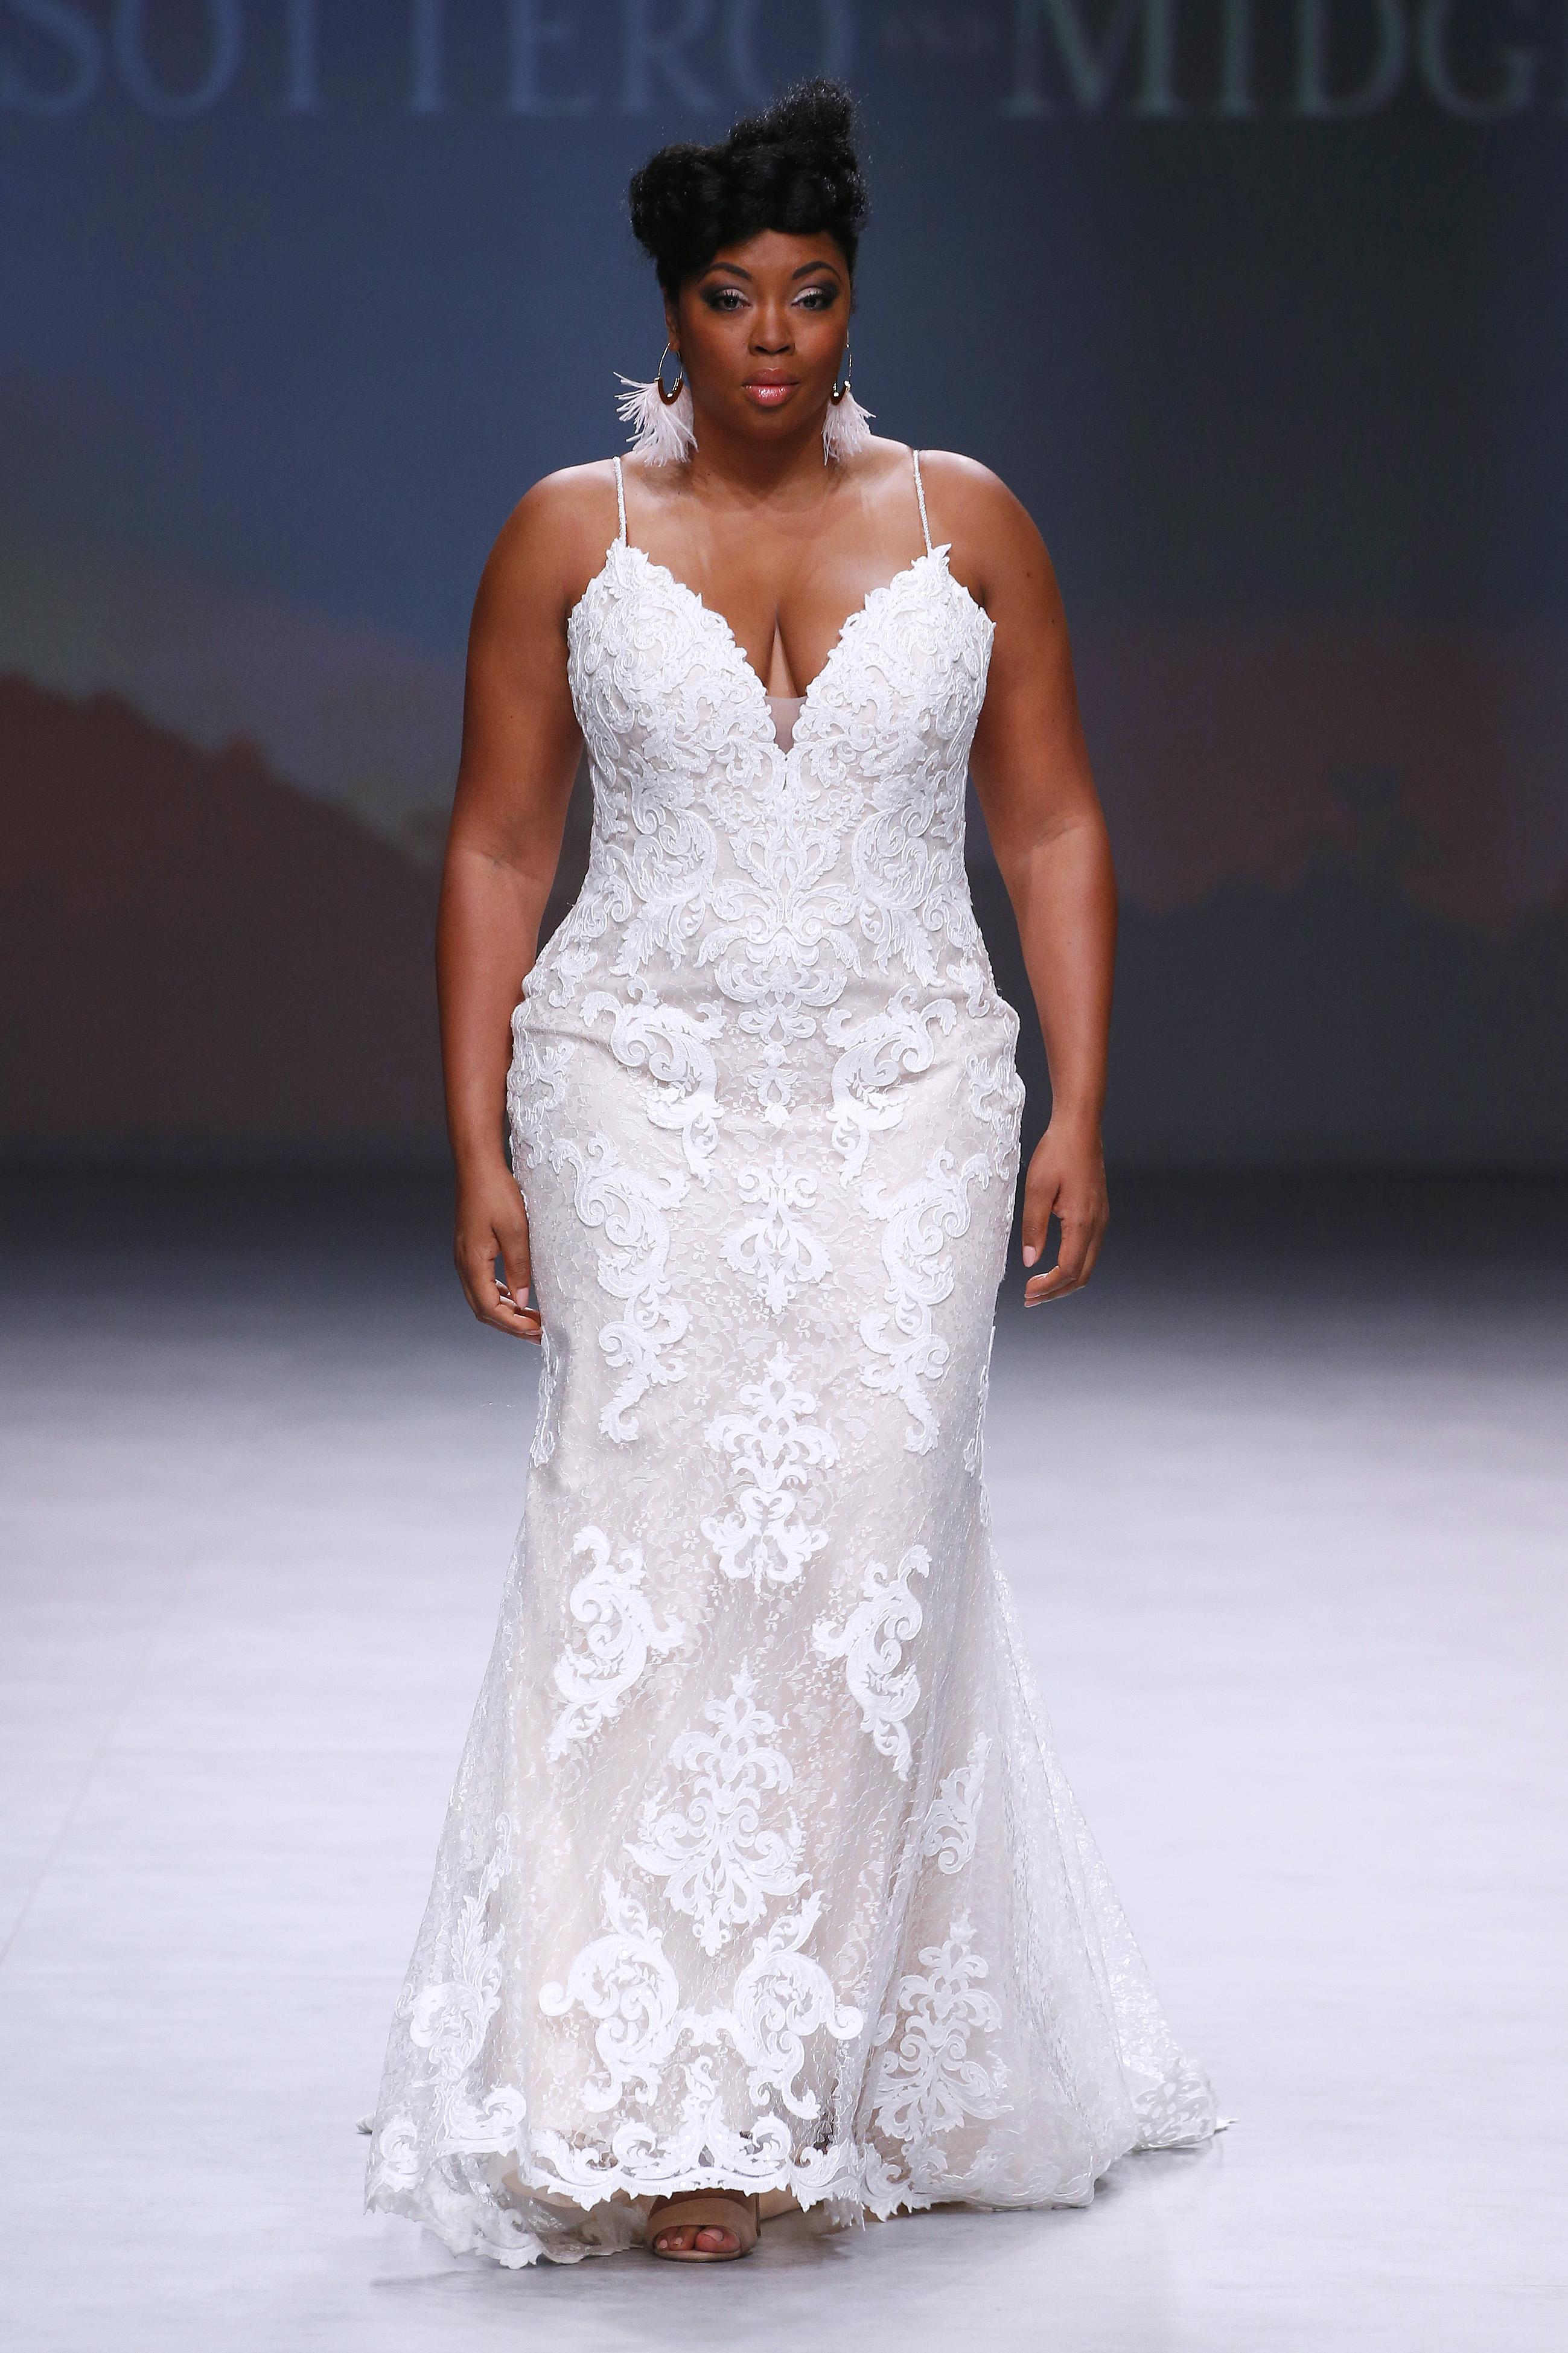 Day 4 - Valmont Barcelona Bridal Fashion Week 2019